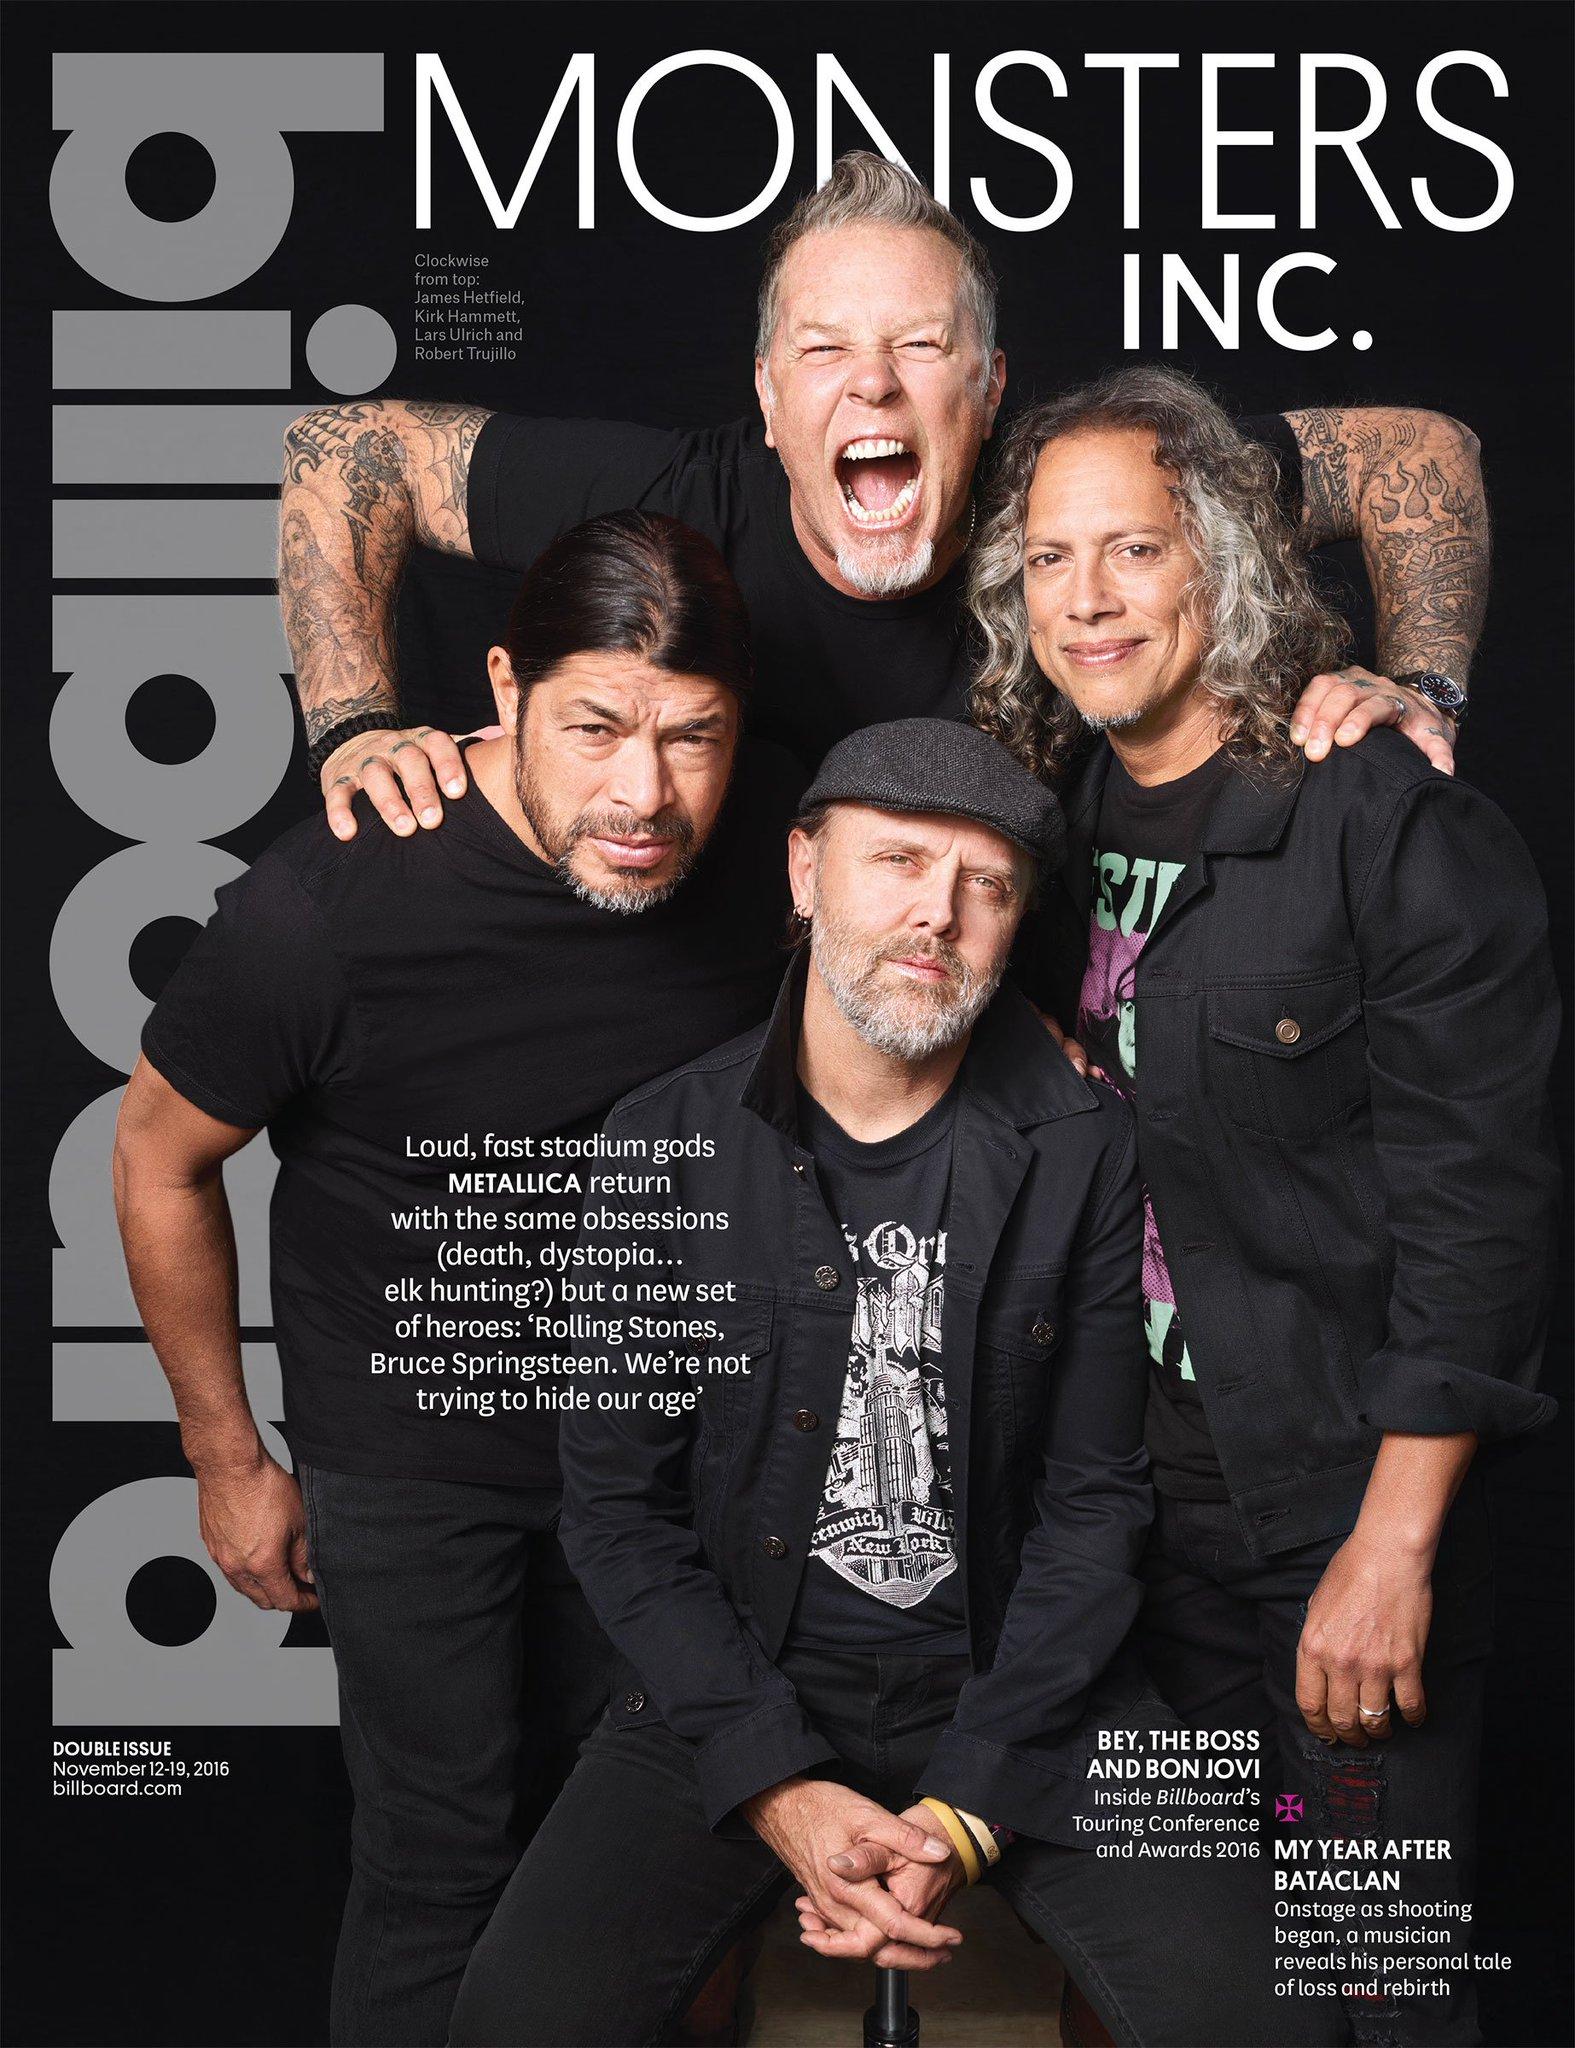 billboard magazine subscription - 736×956